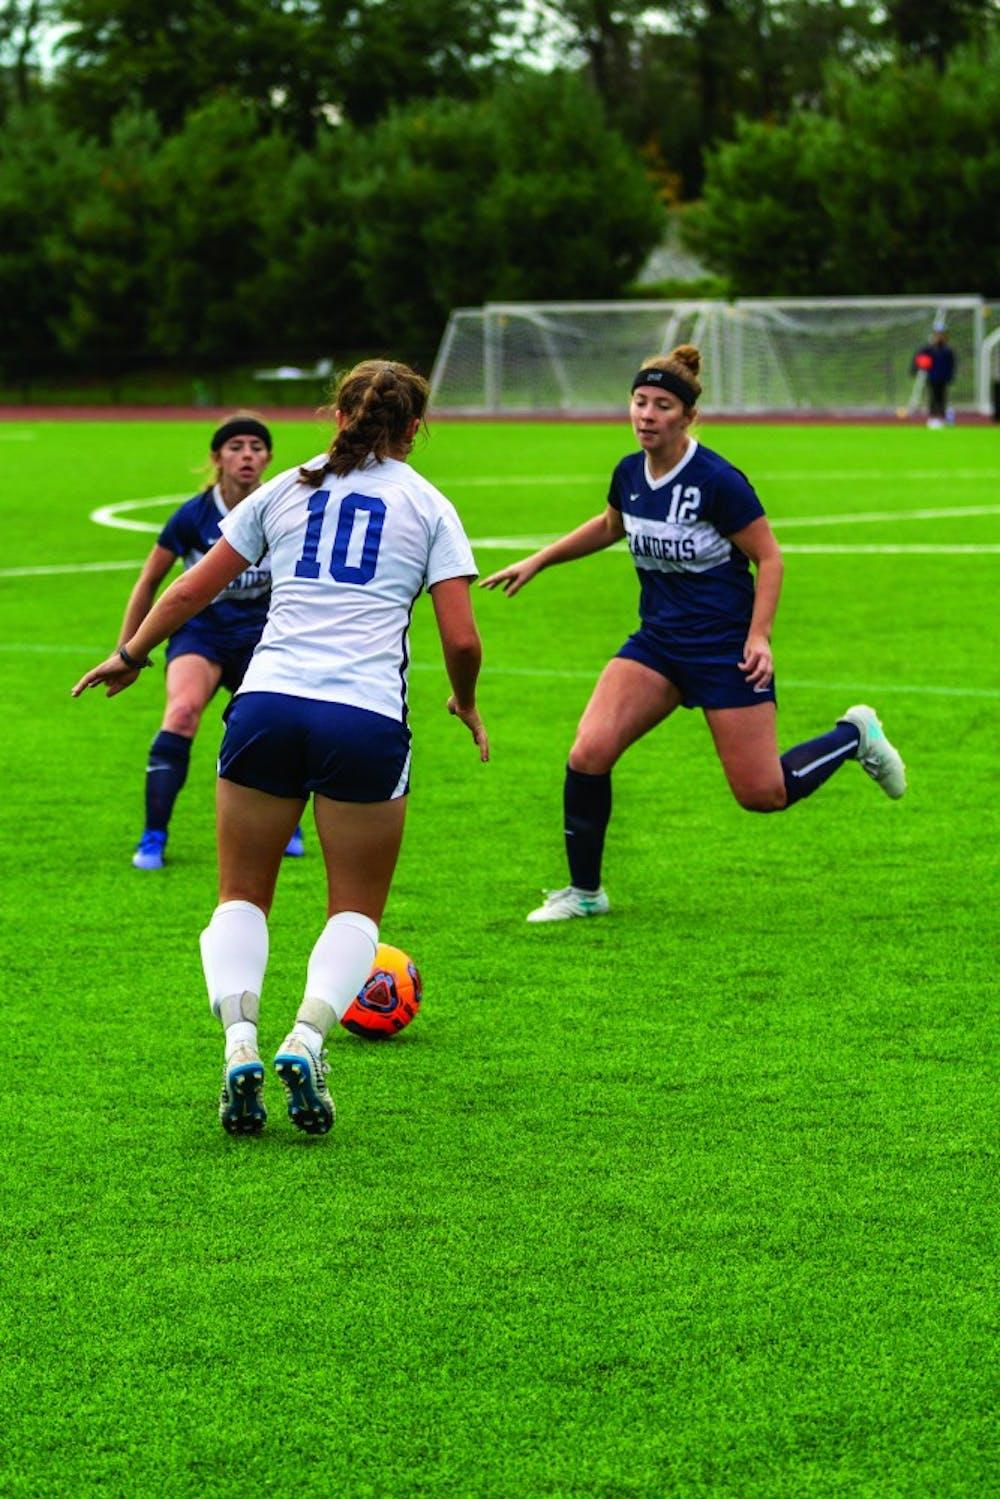 soccer-w-vs-emory-10-14-18-cc-0228